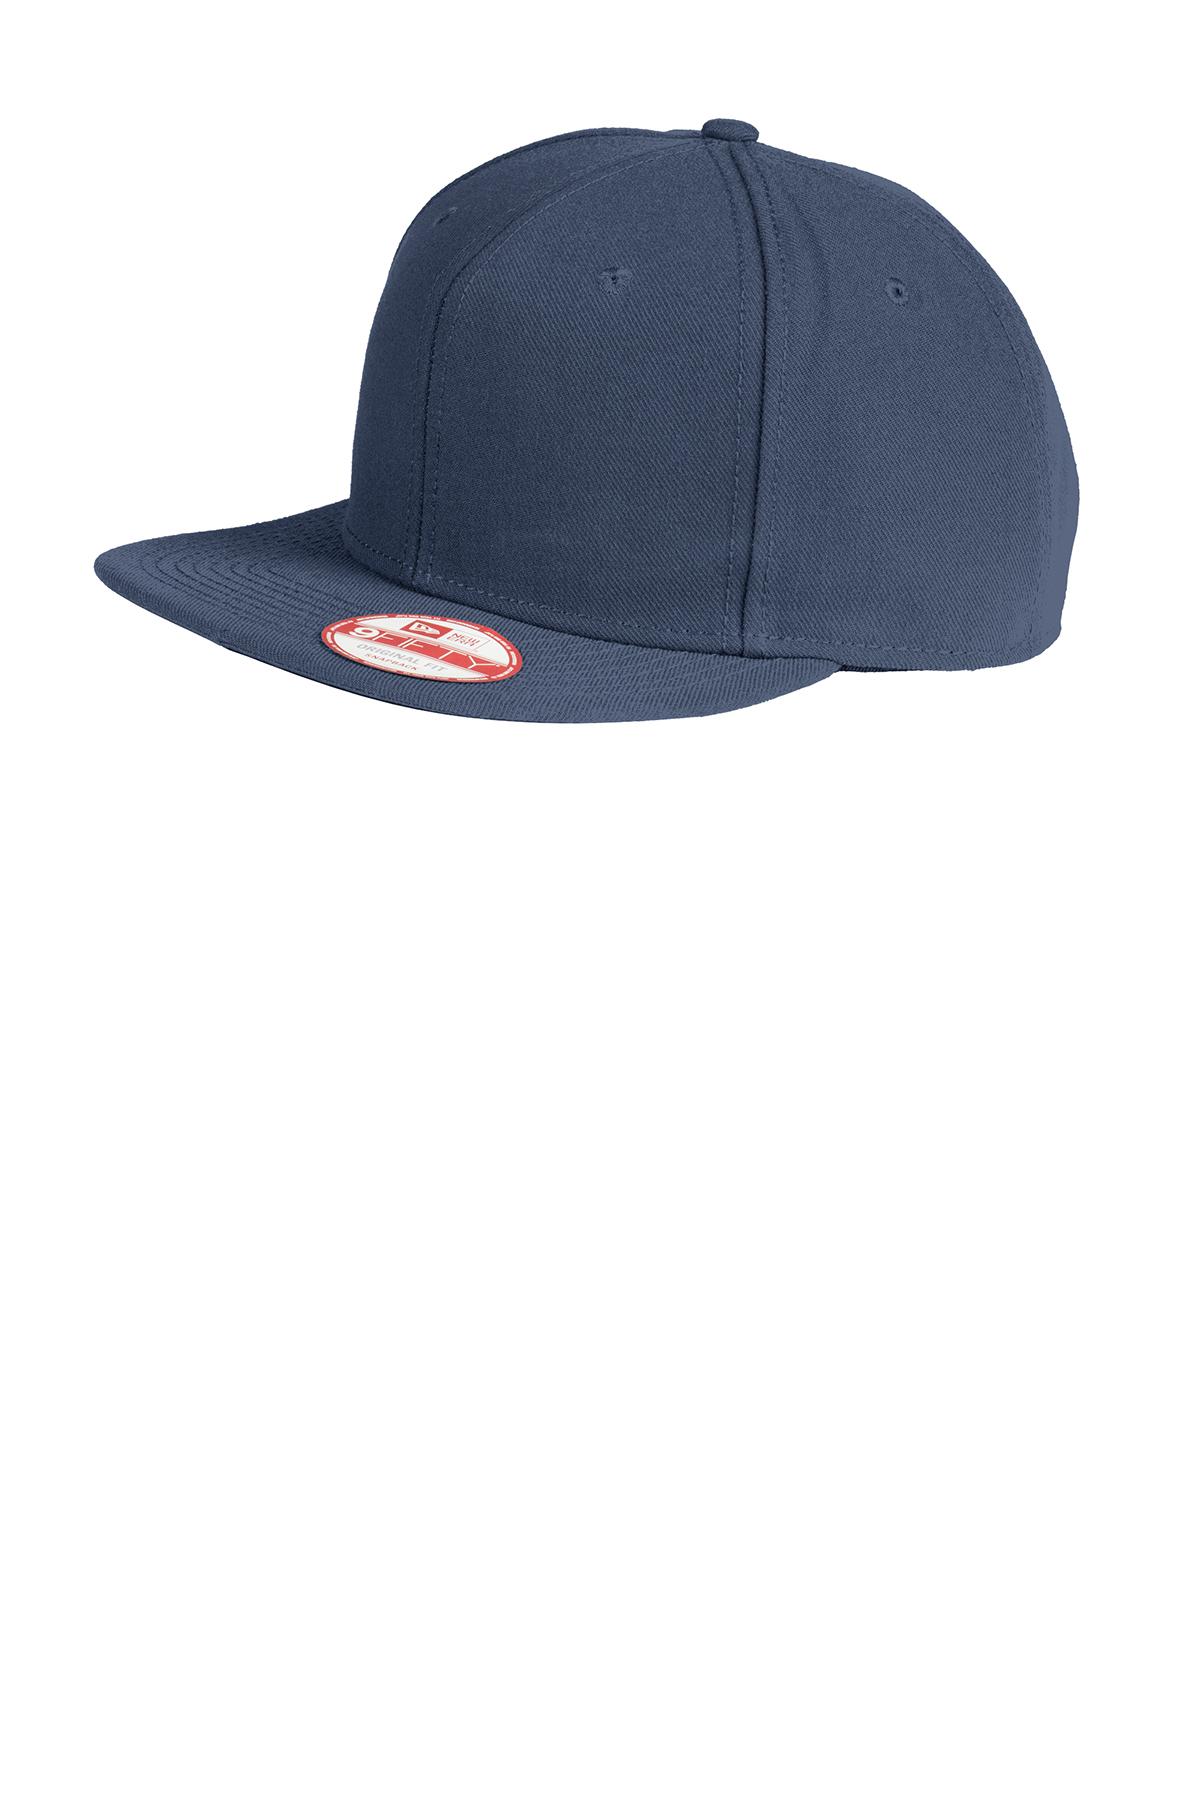 b1a95feafb151 New Era® Original Fit Flat Bill Snapback Cap